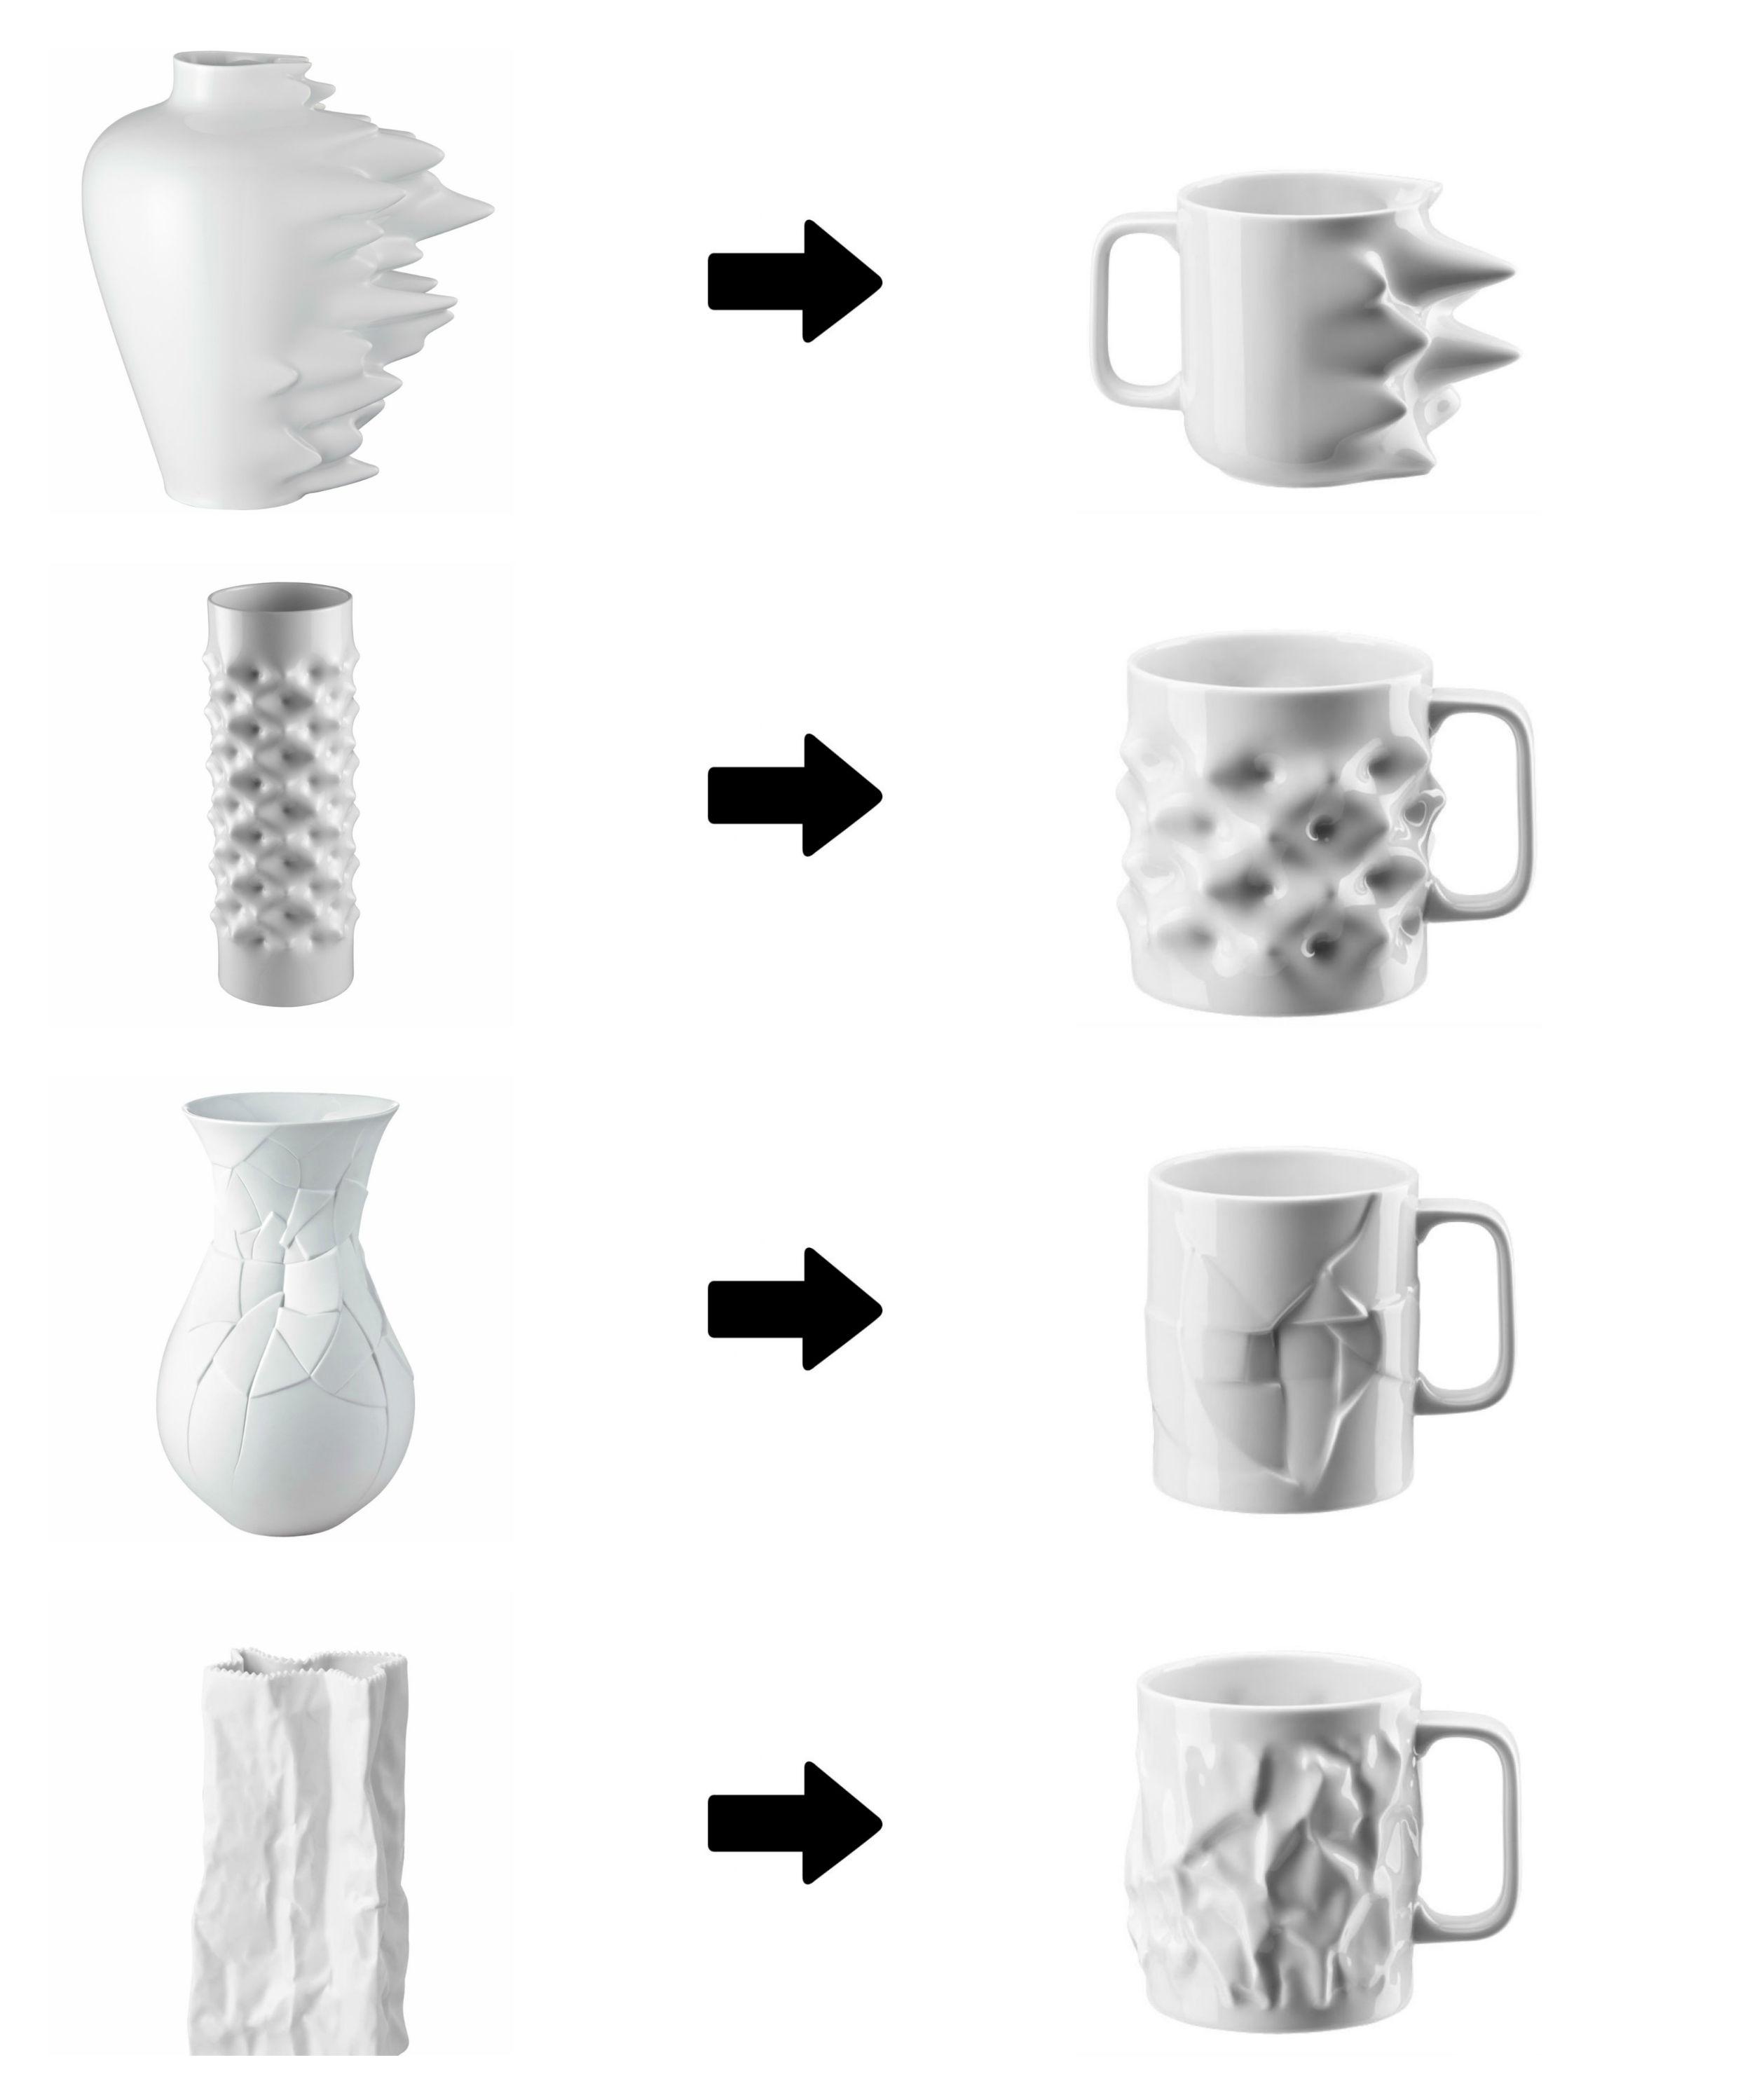 Vases-Tasse-design-porcelaine-rosenthal